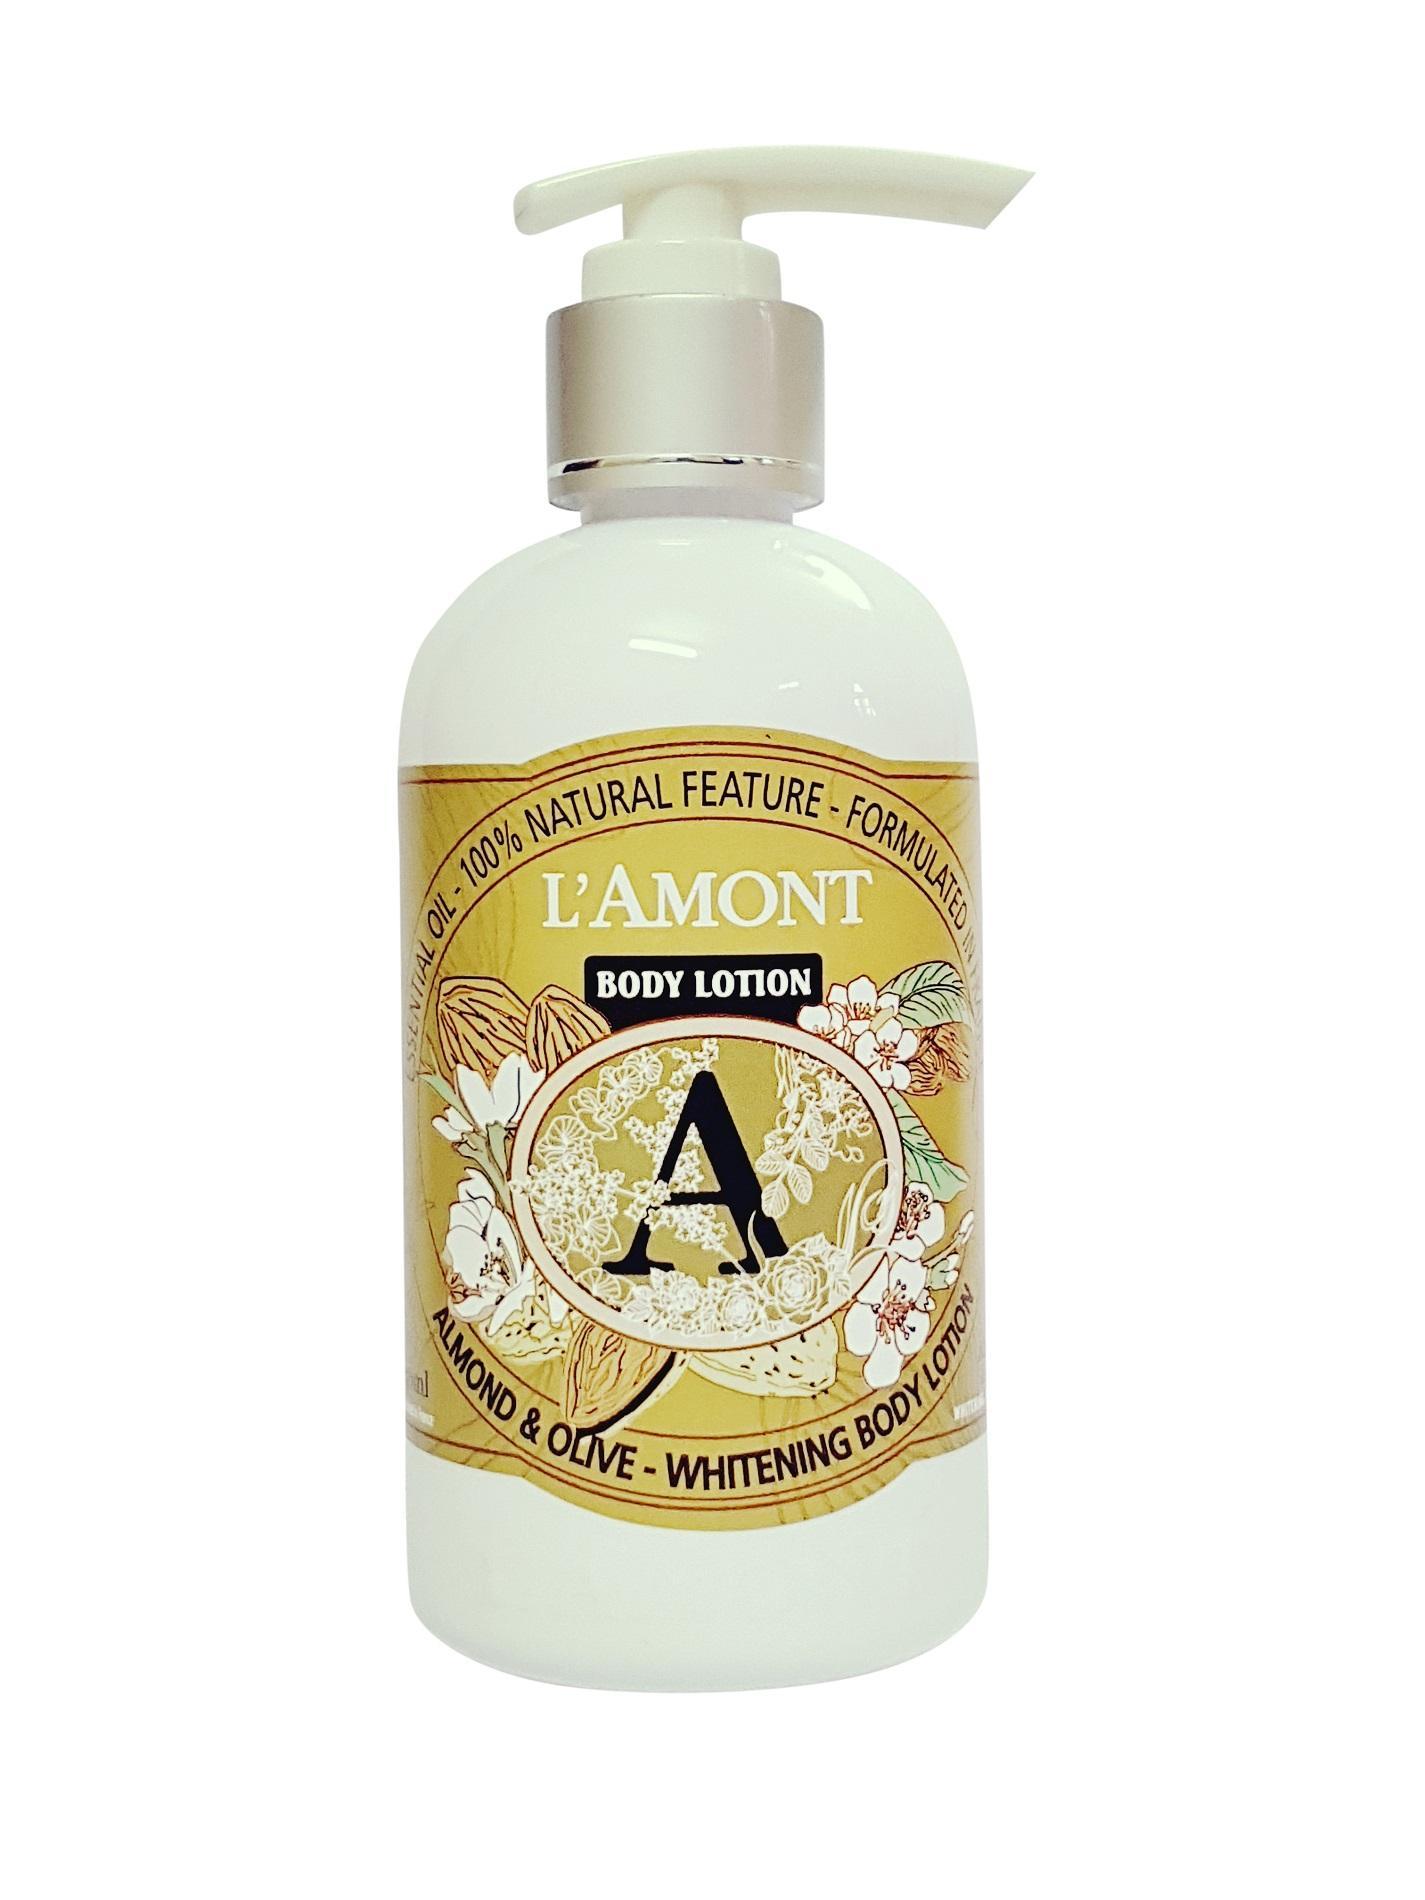 Sữa Dưỡng Thể Lamont En Provence Almond & Olive Whitening Body Lotion Chai 250ml tốt nhất